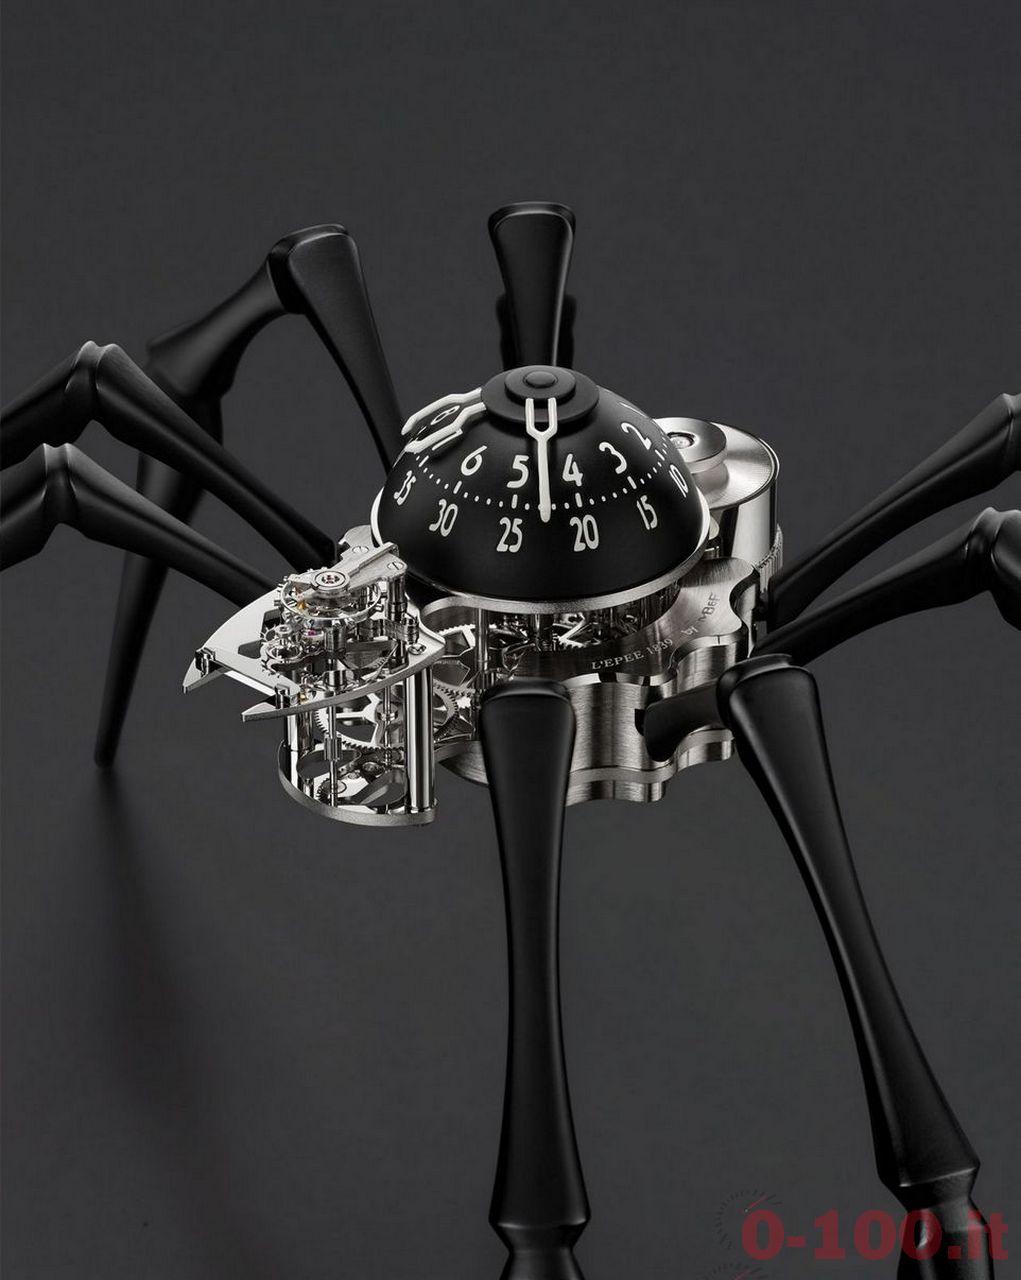 mbf-arachnophobia-lepee-1839_0-1004